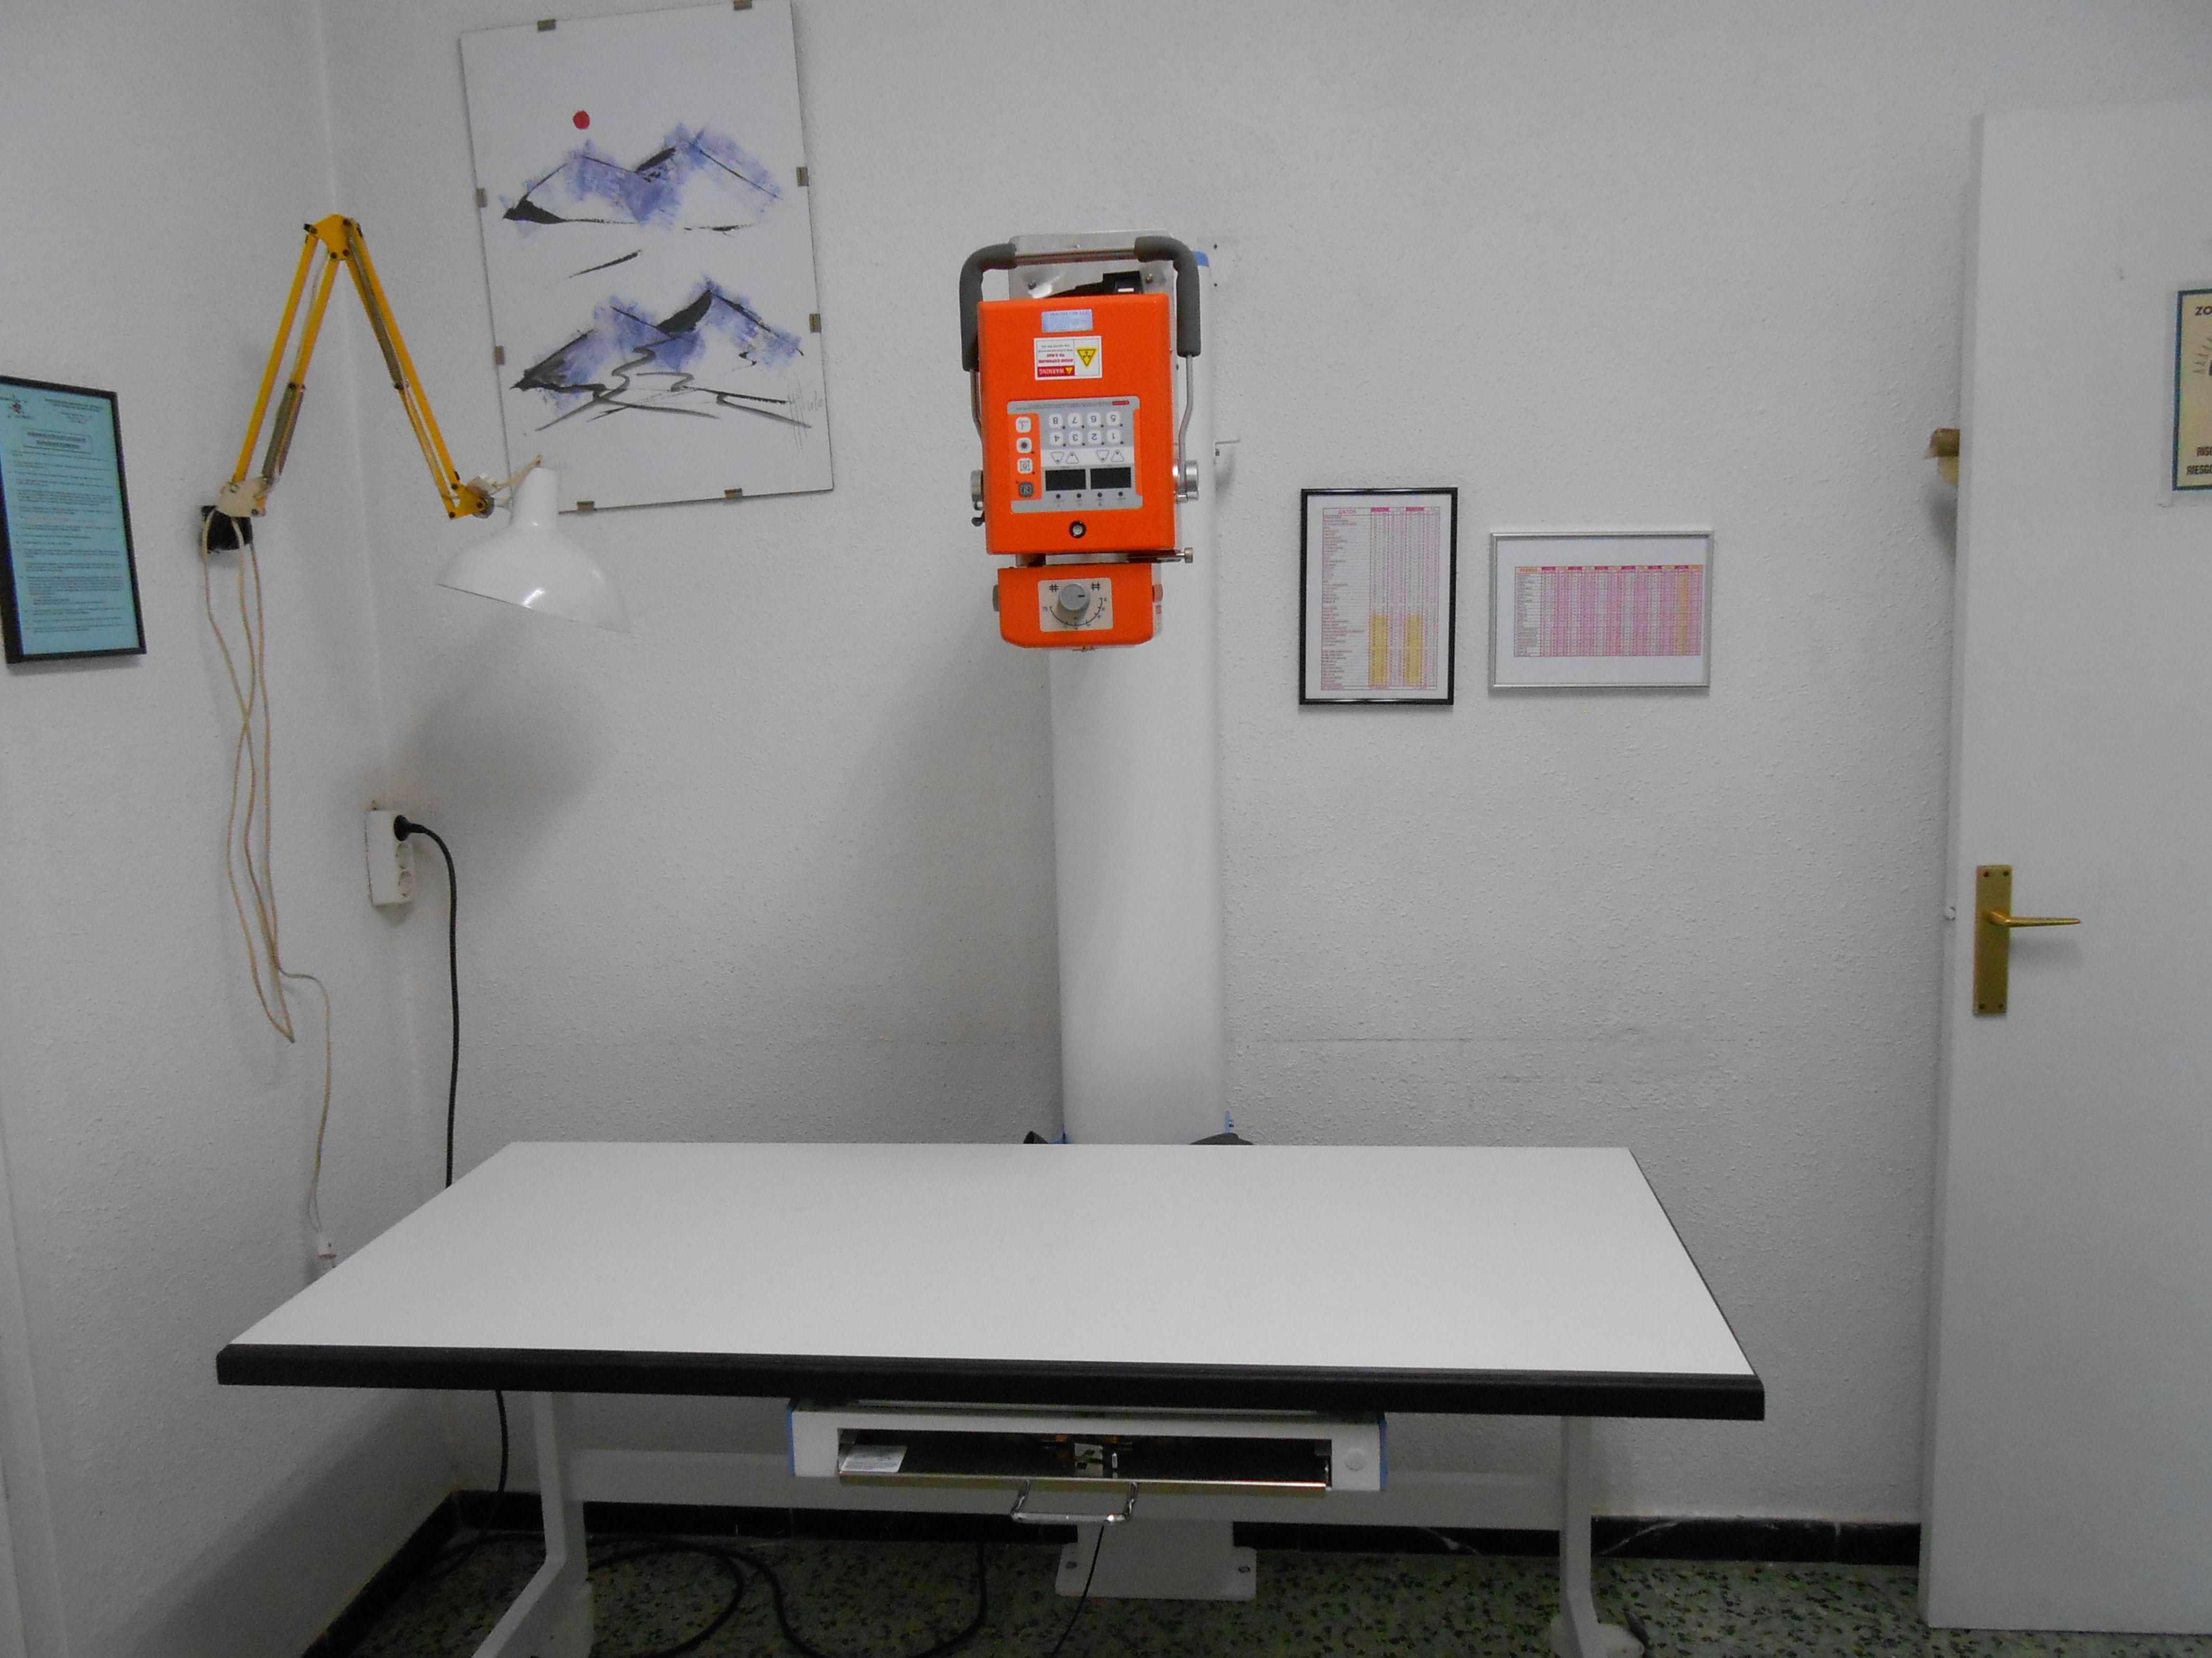 Diagnóstico por la imagen : Servicios de Clínica Vet. Verdum